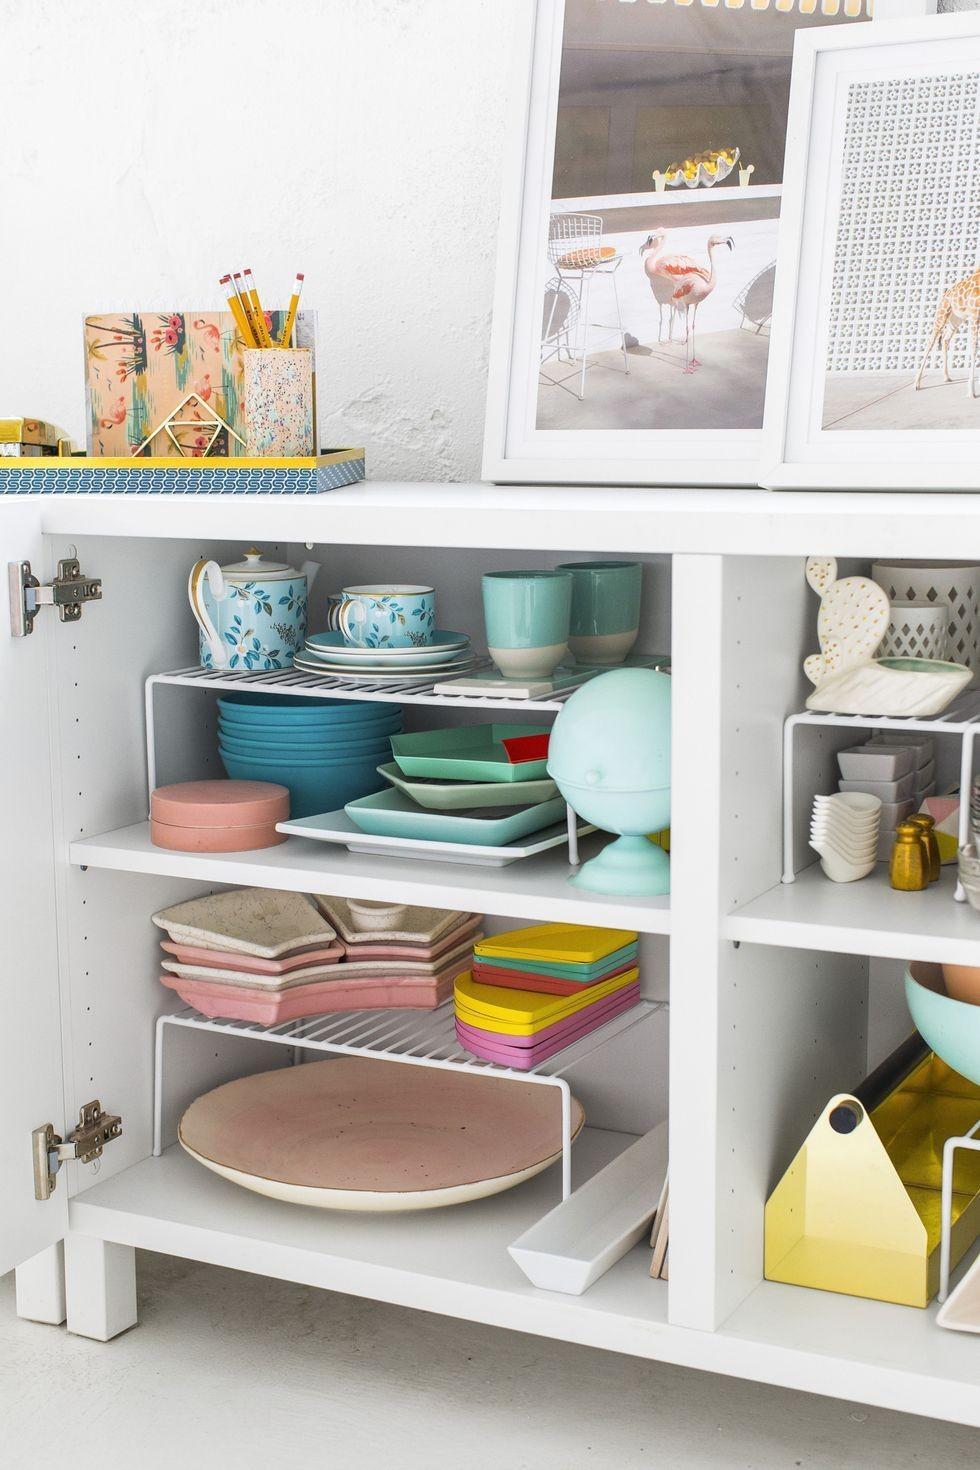 tips menata dapur kecil 2